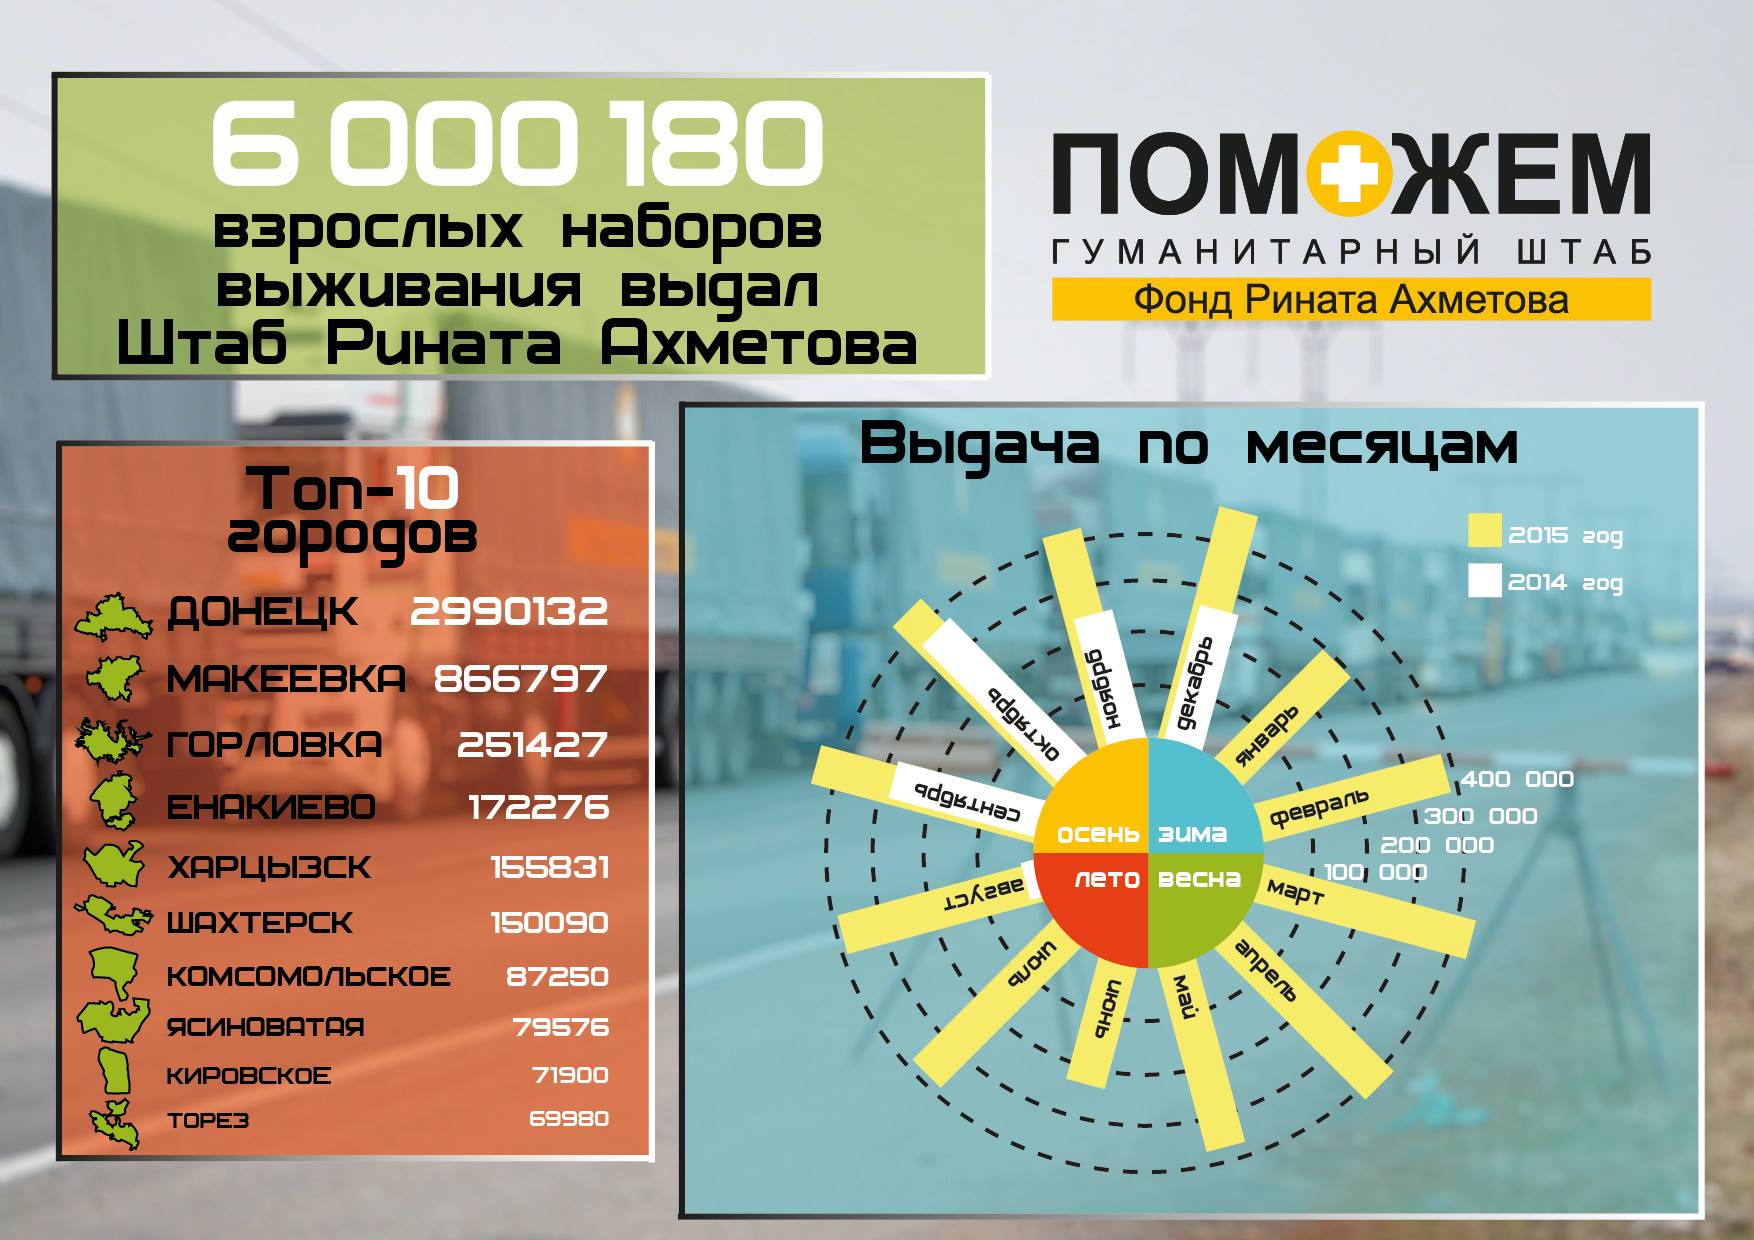 12546103_1212895685391627_199453658_o.jpg